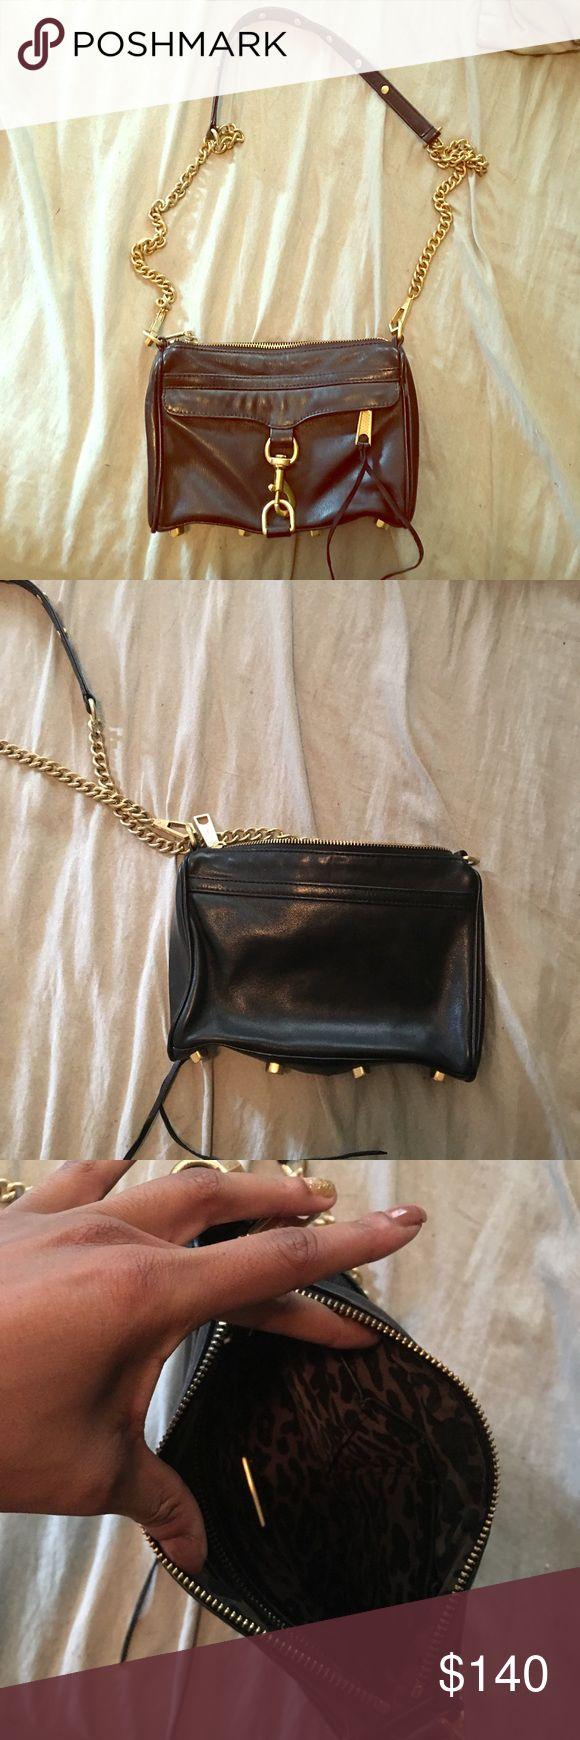 Rebecca Minkoff mini mac bag Rebecca minkoff handbag. Black with matte gold chain. Totally forgot I had this. Good condition, inside is clean! Rebecca Minkoff Bags Crossbody Bags